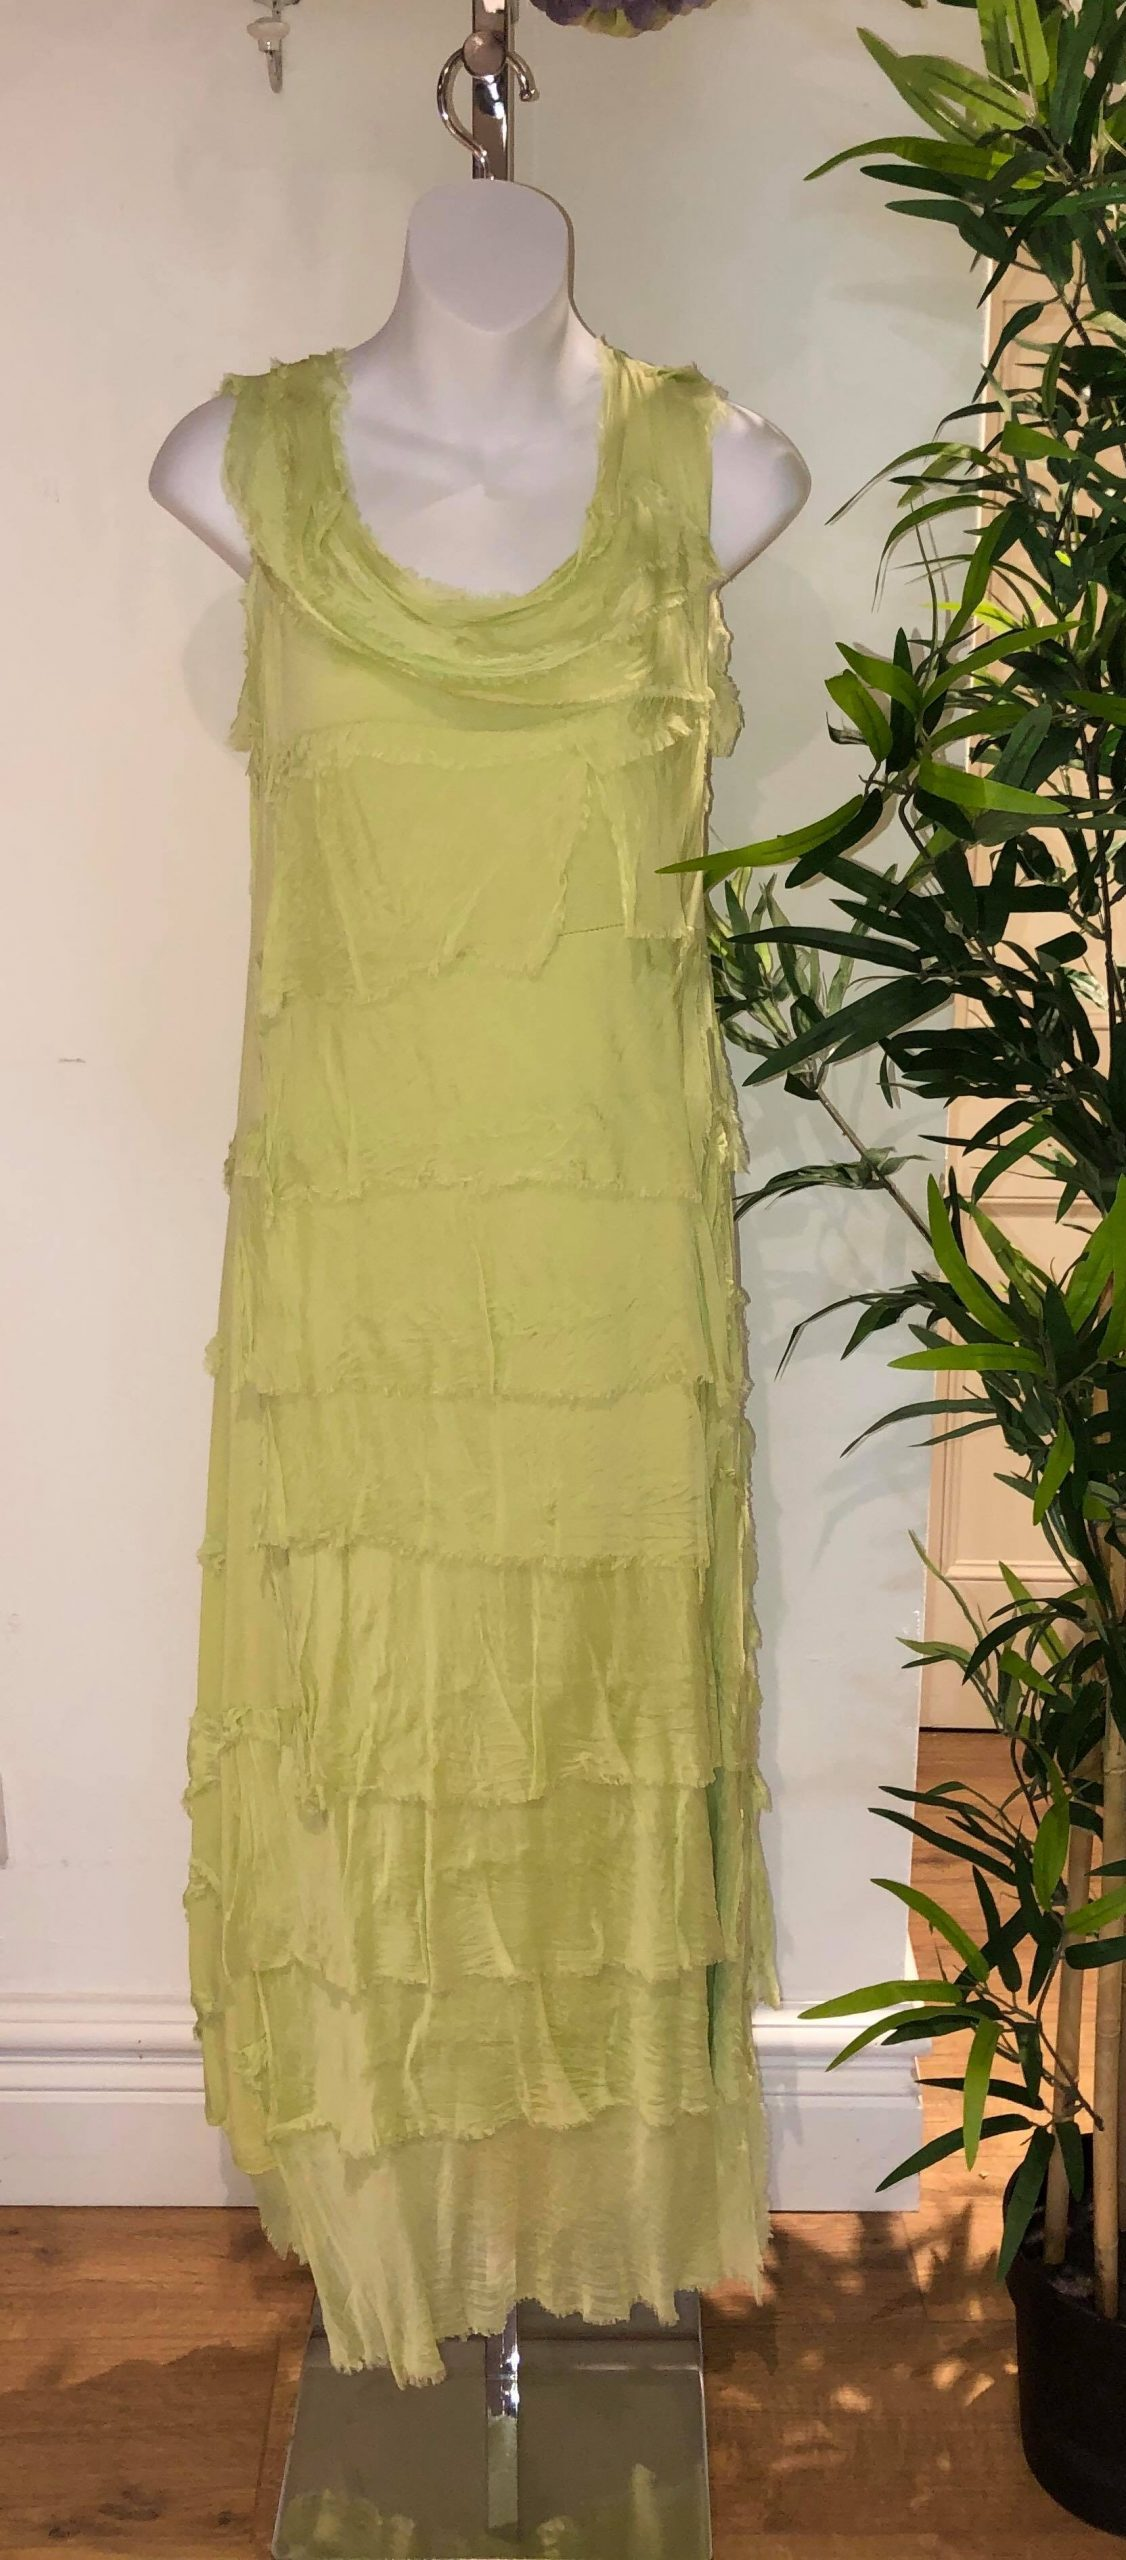 Lime green ruffle dress